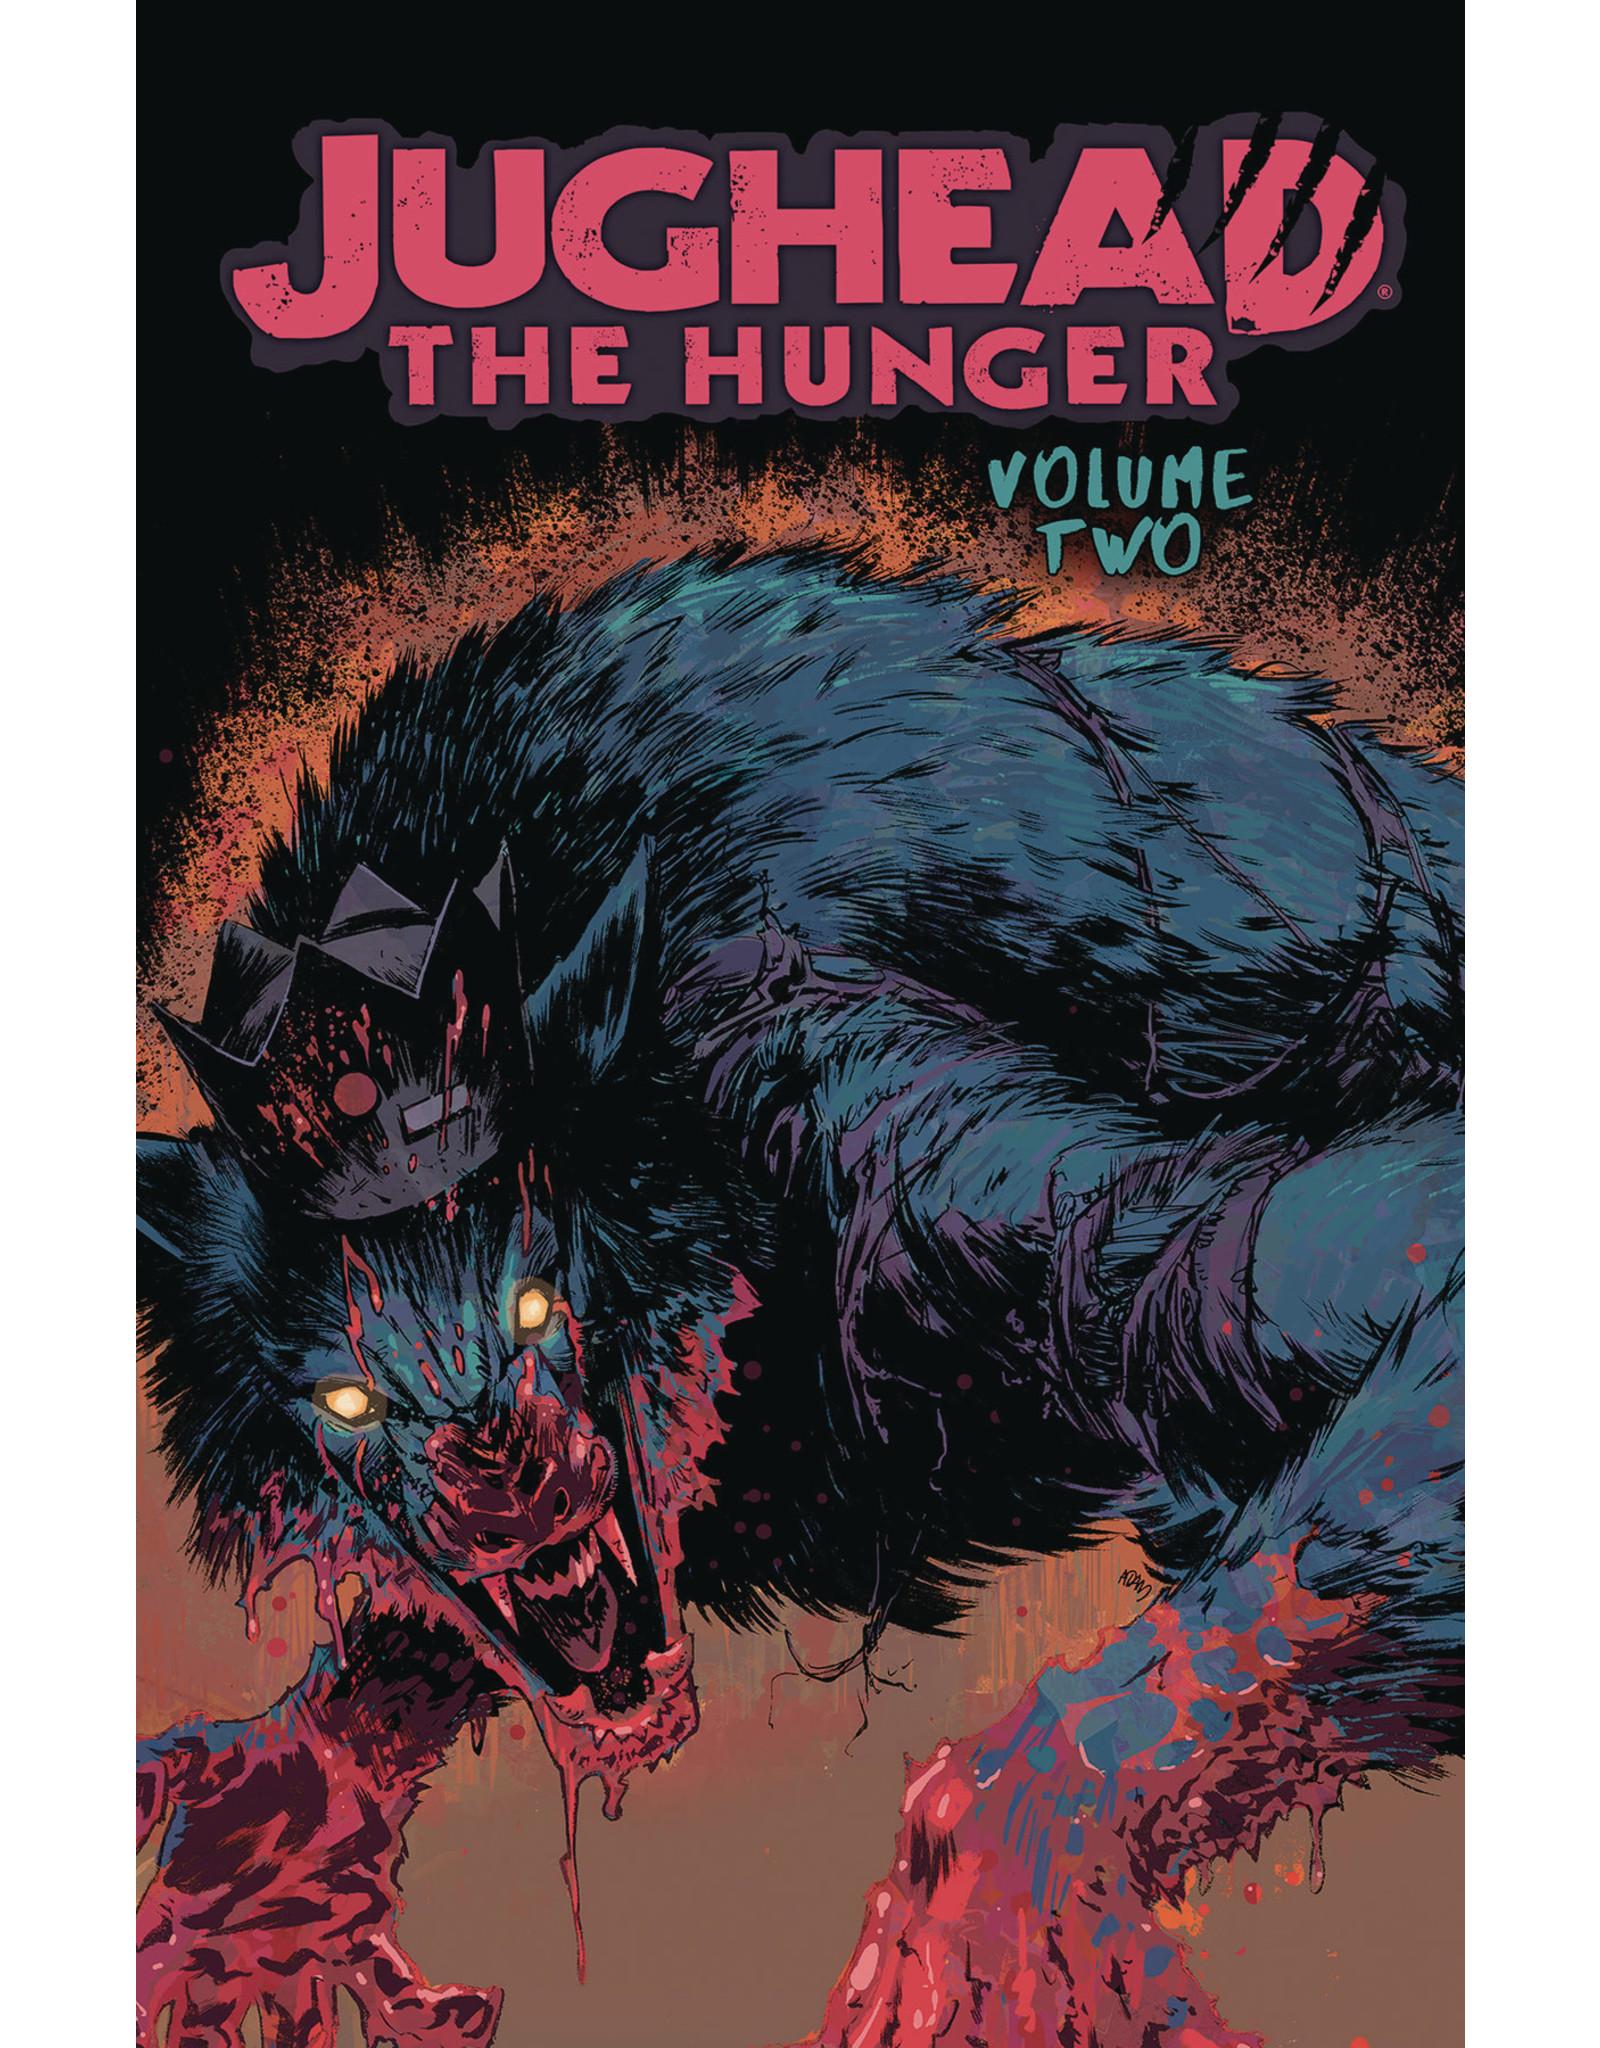 ARCHIE COMIC PUBLICATIONS JUGHEAD HUNGER TP VOL 02